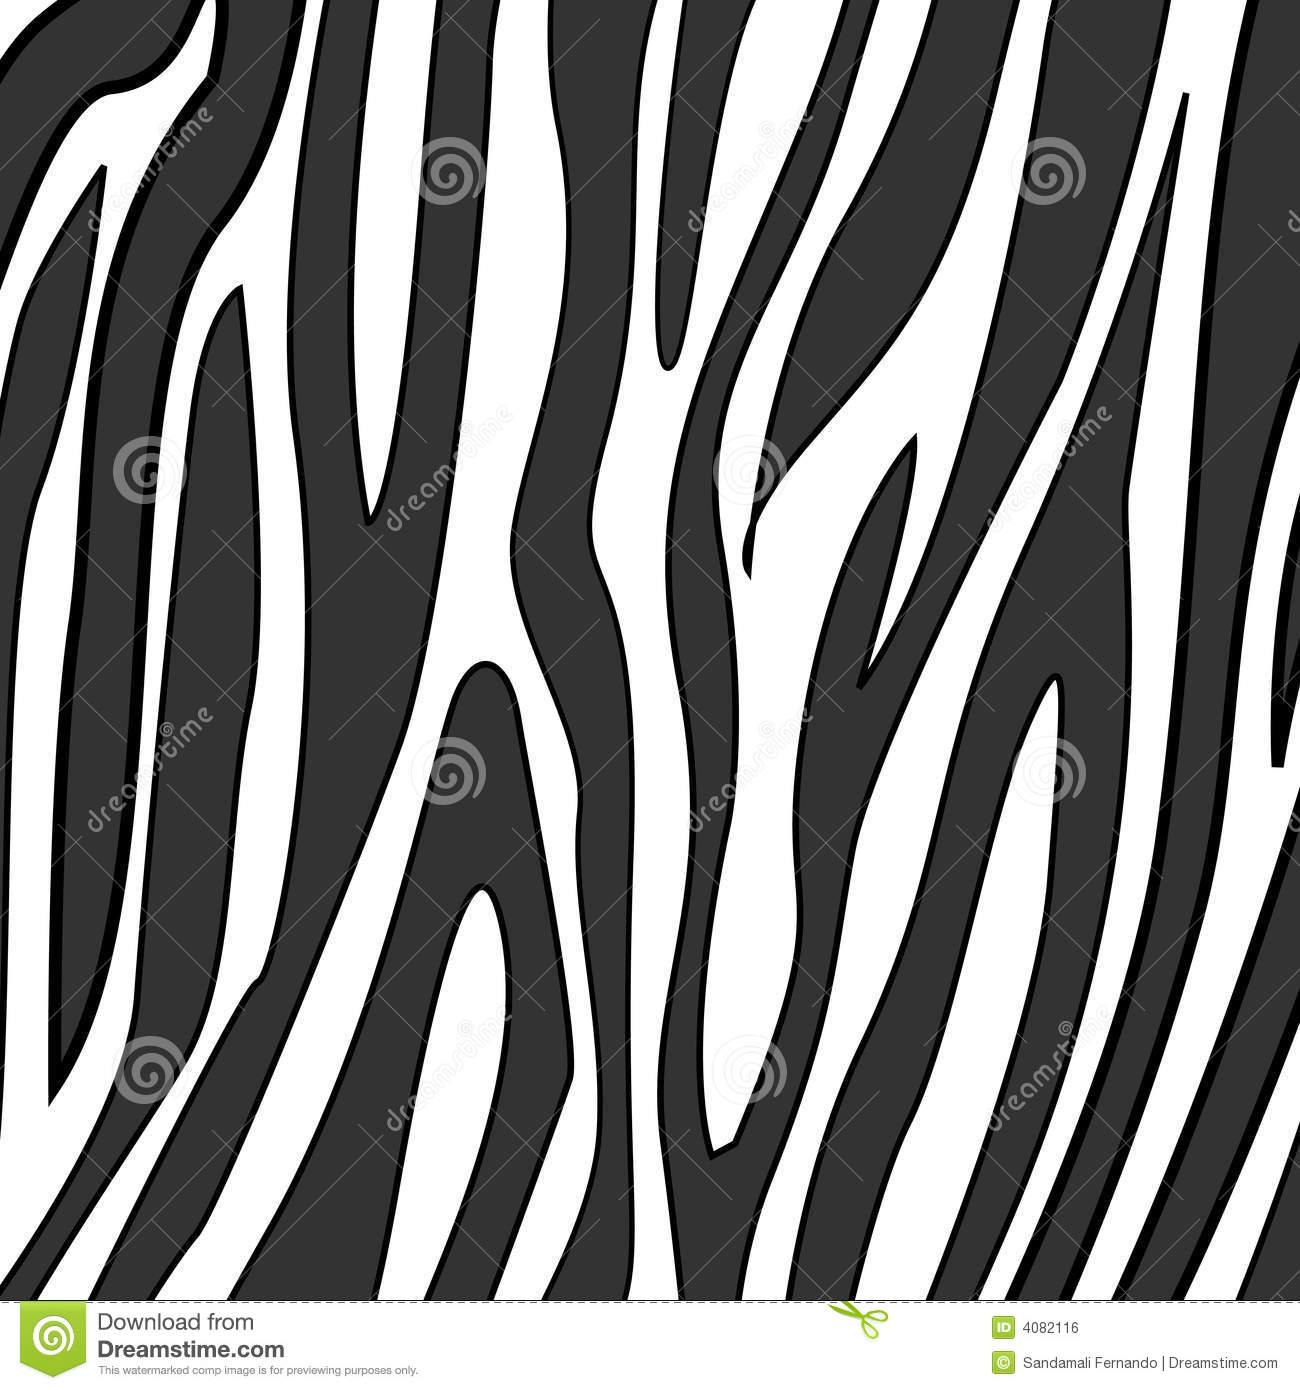 Zebra Print stock vector. Illustration of pattern, clipart.